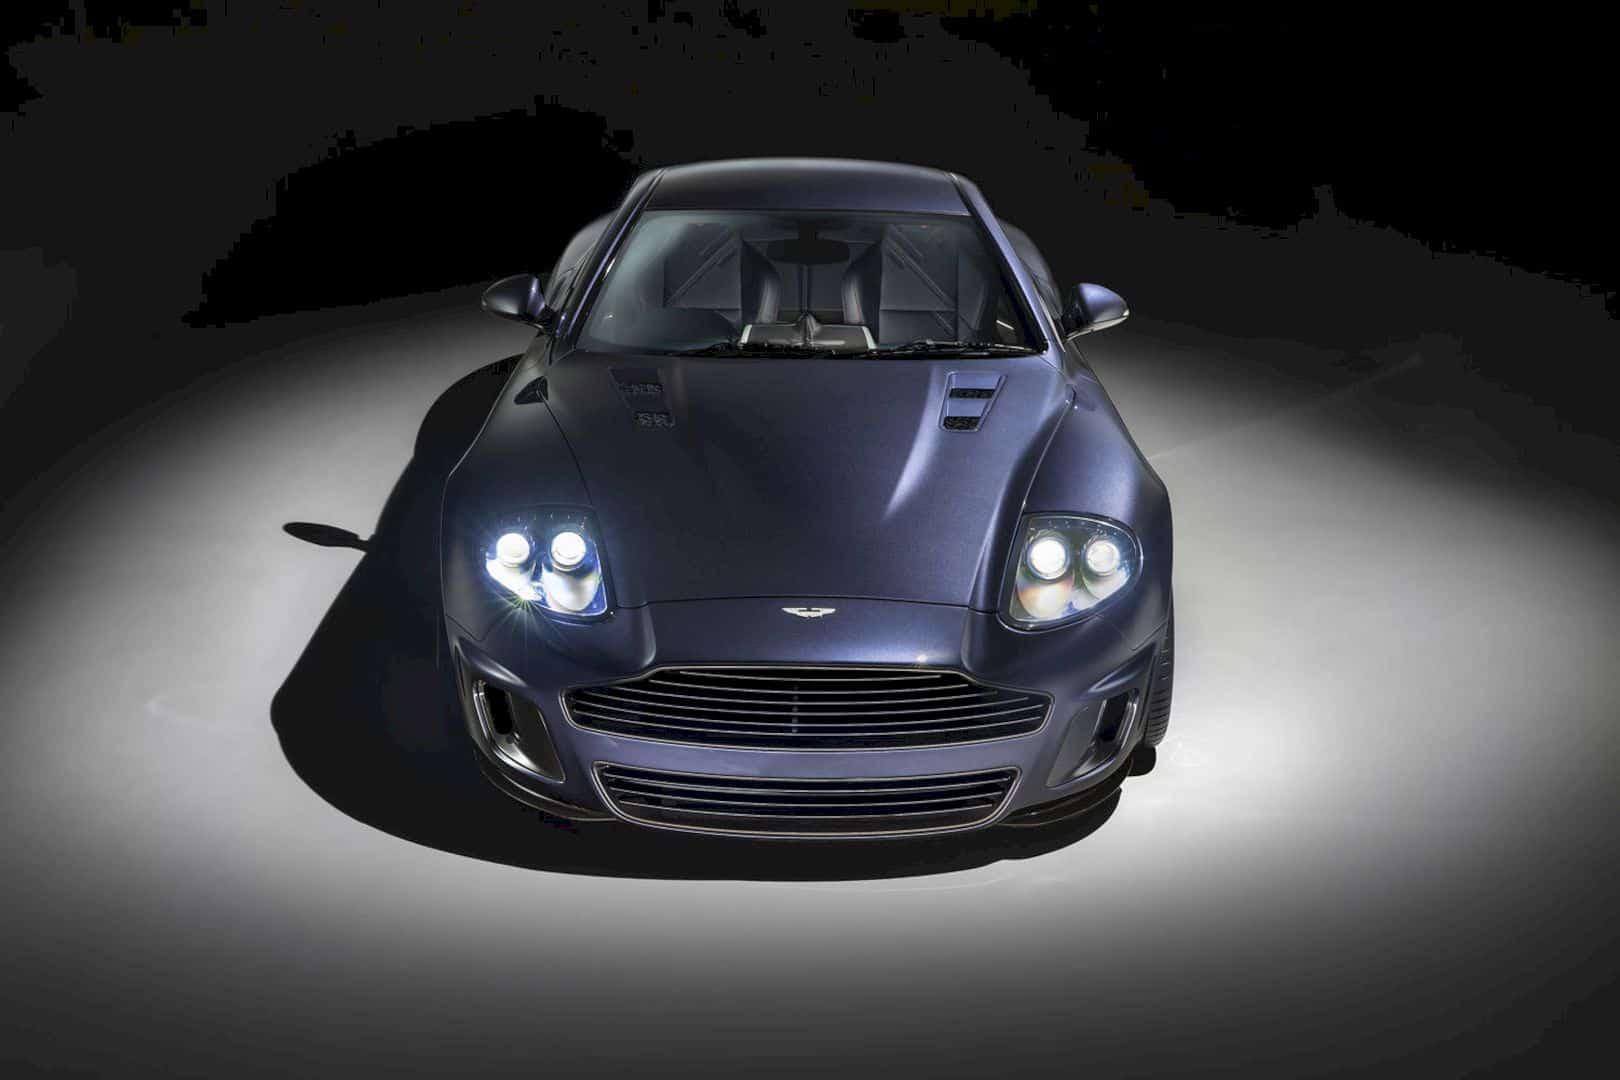 Aston Martin Vanquish 25 8